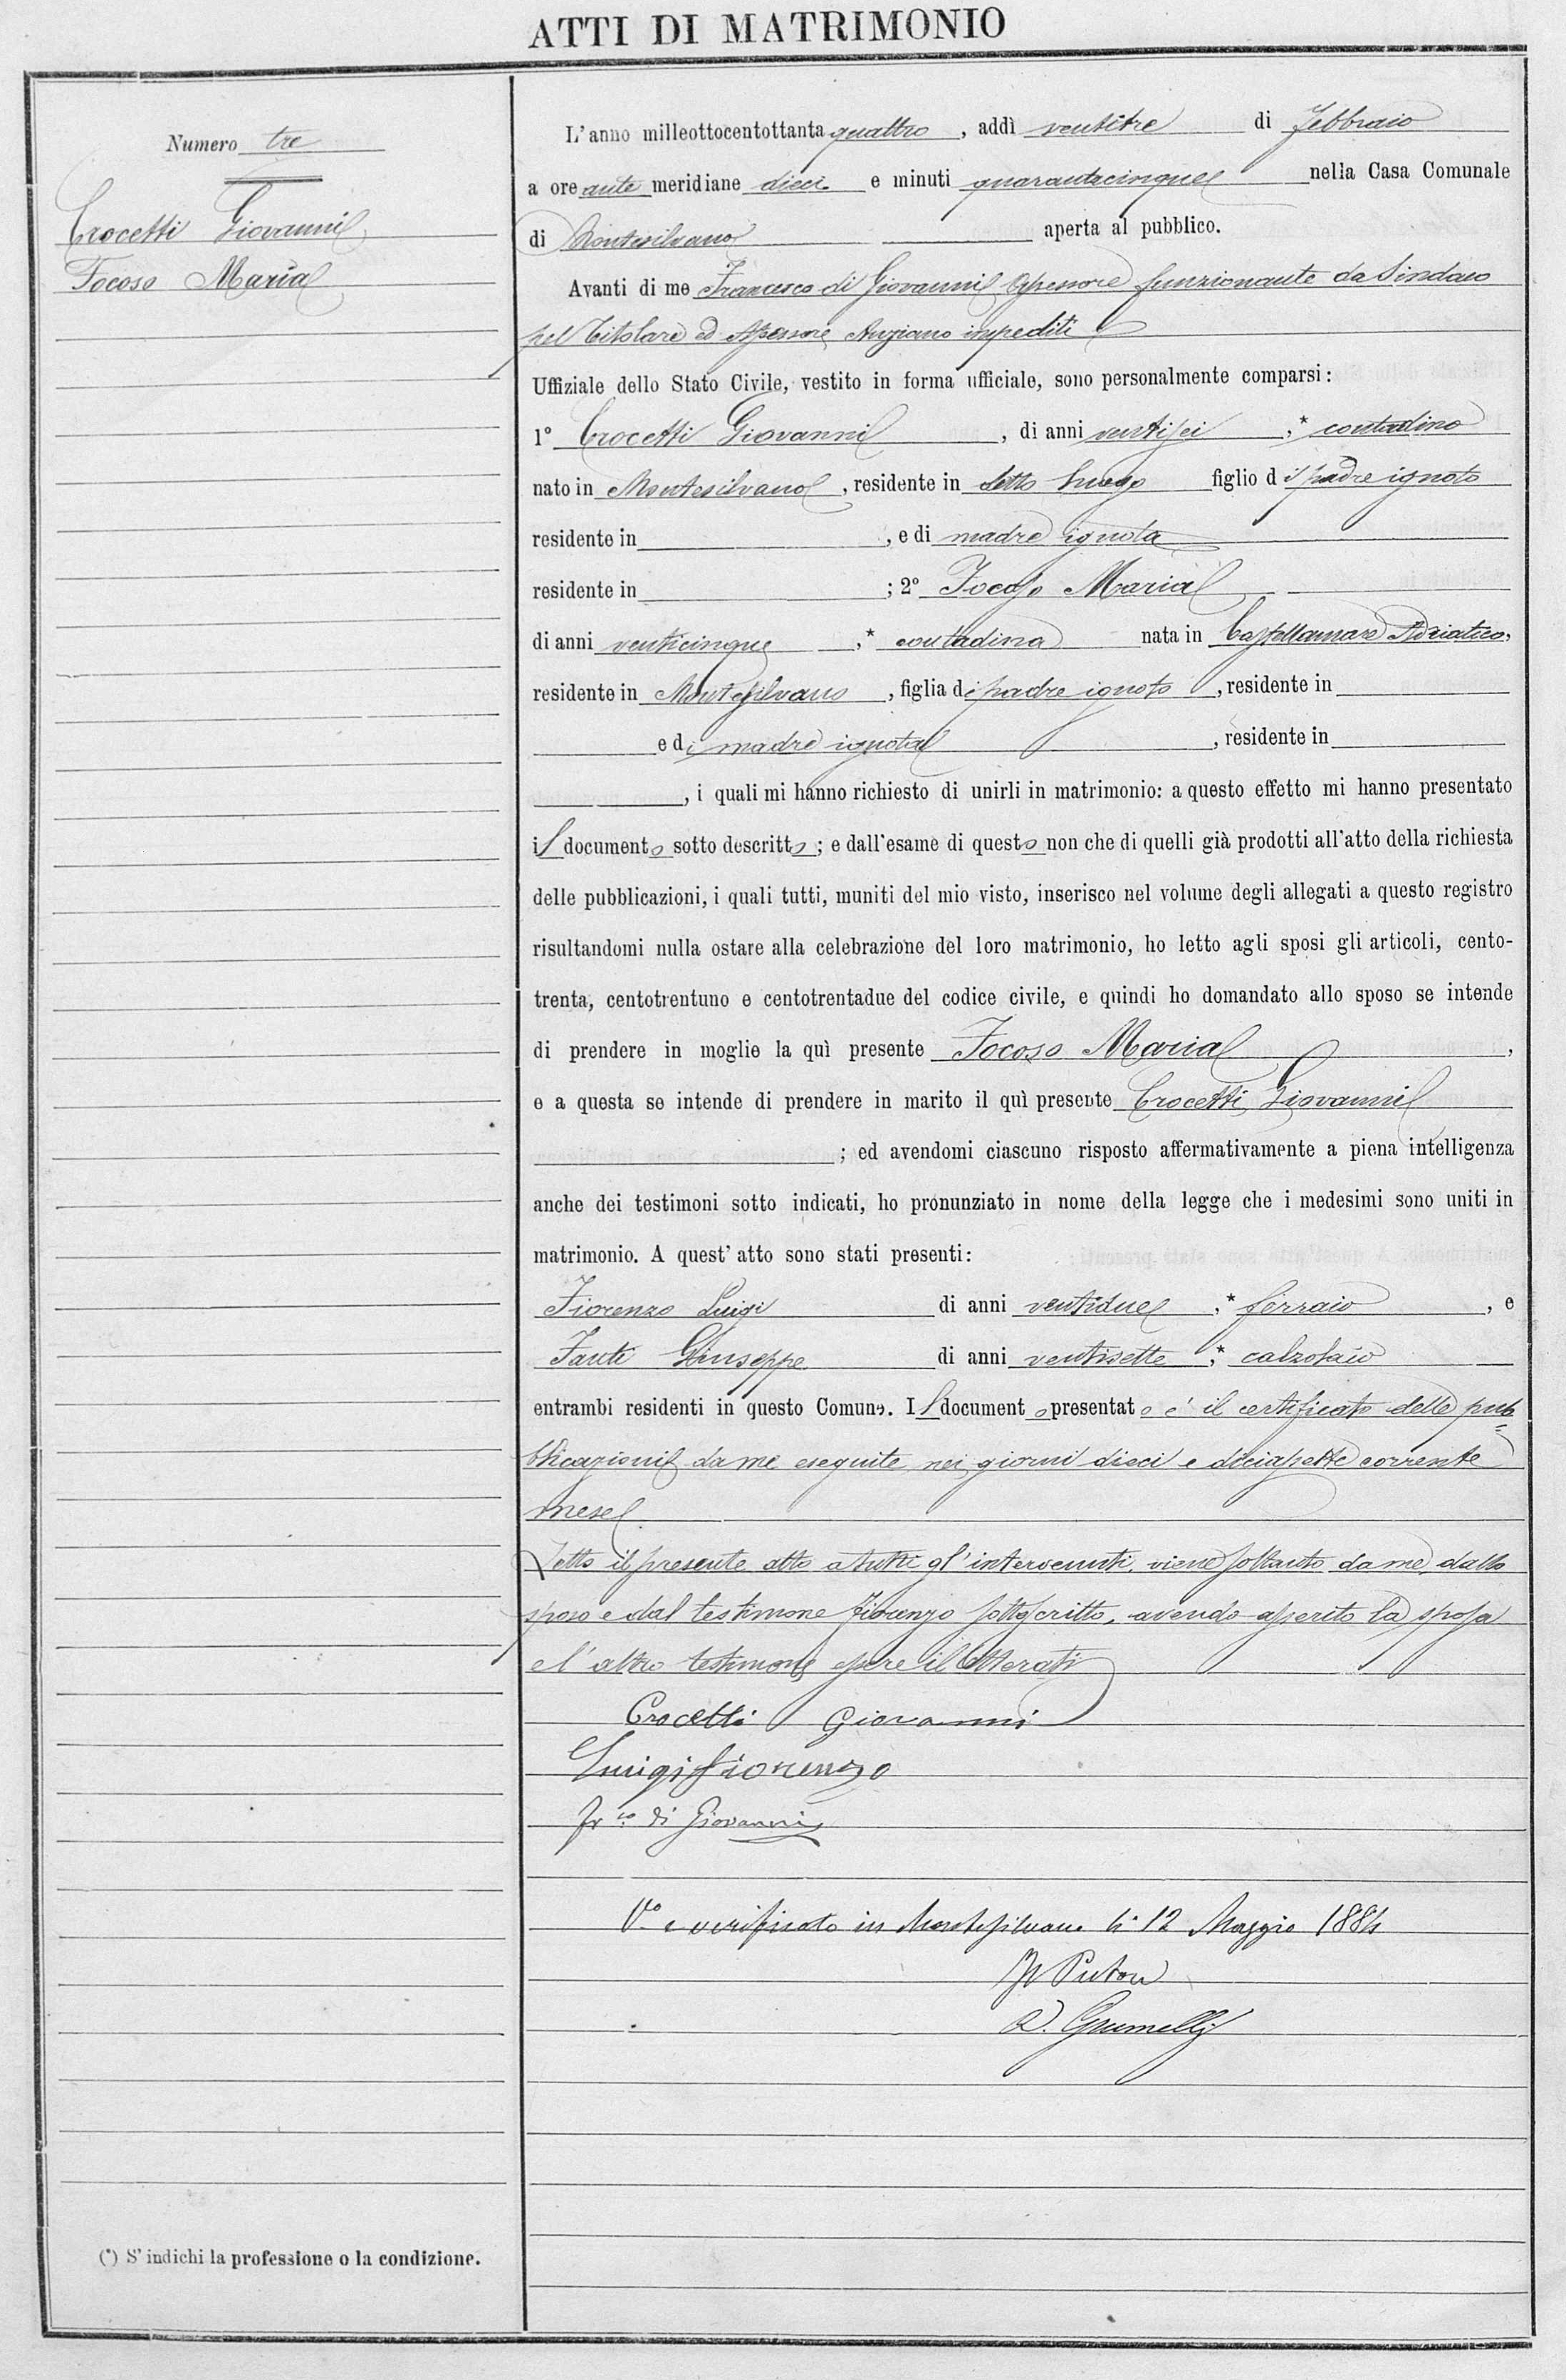 http://www.genealogiafamiliare.it/wp/wp-content/uploads/2018/03/Marriage-Crocetti-Focoso.jpg